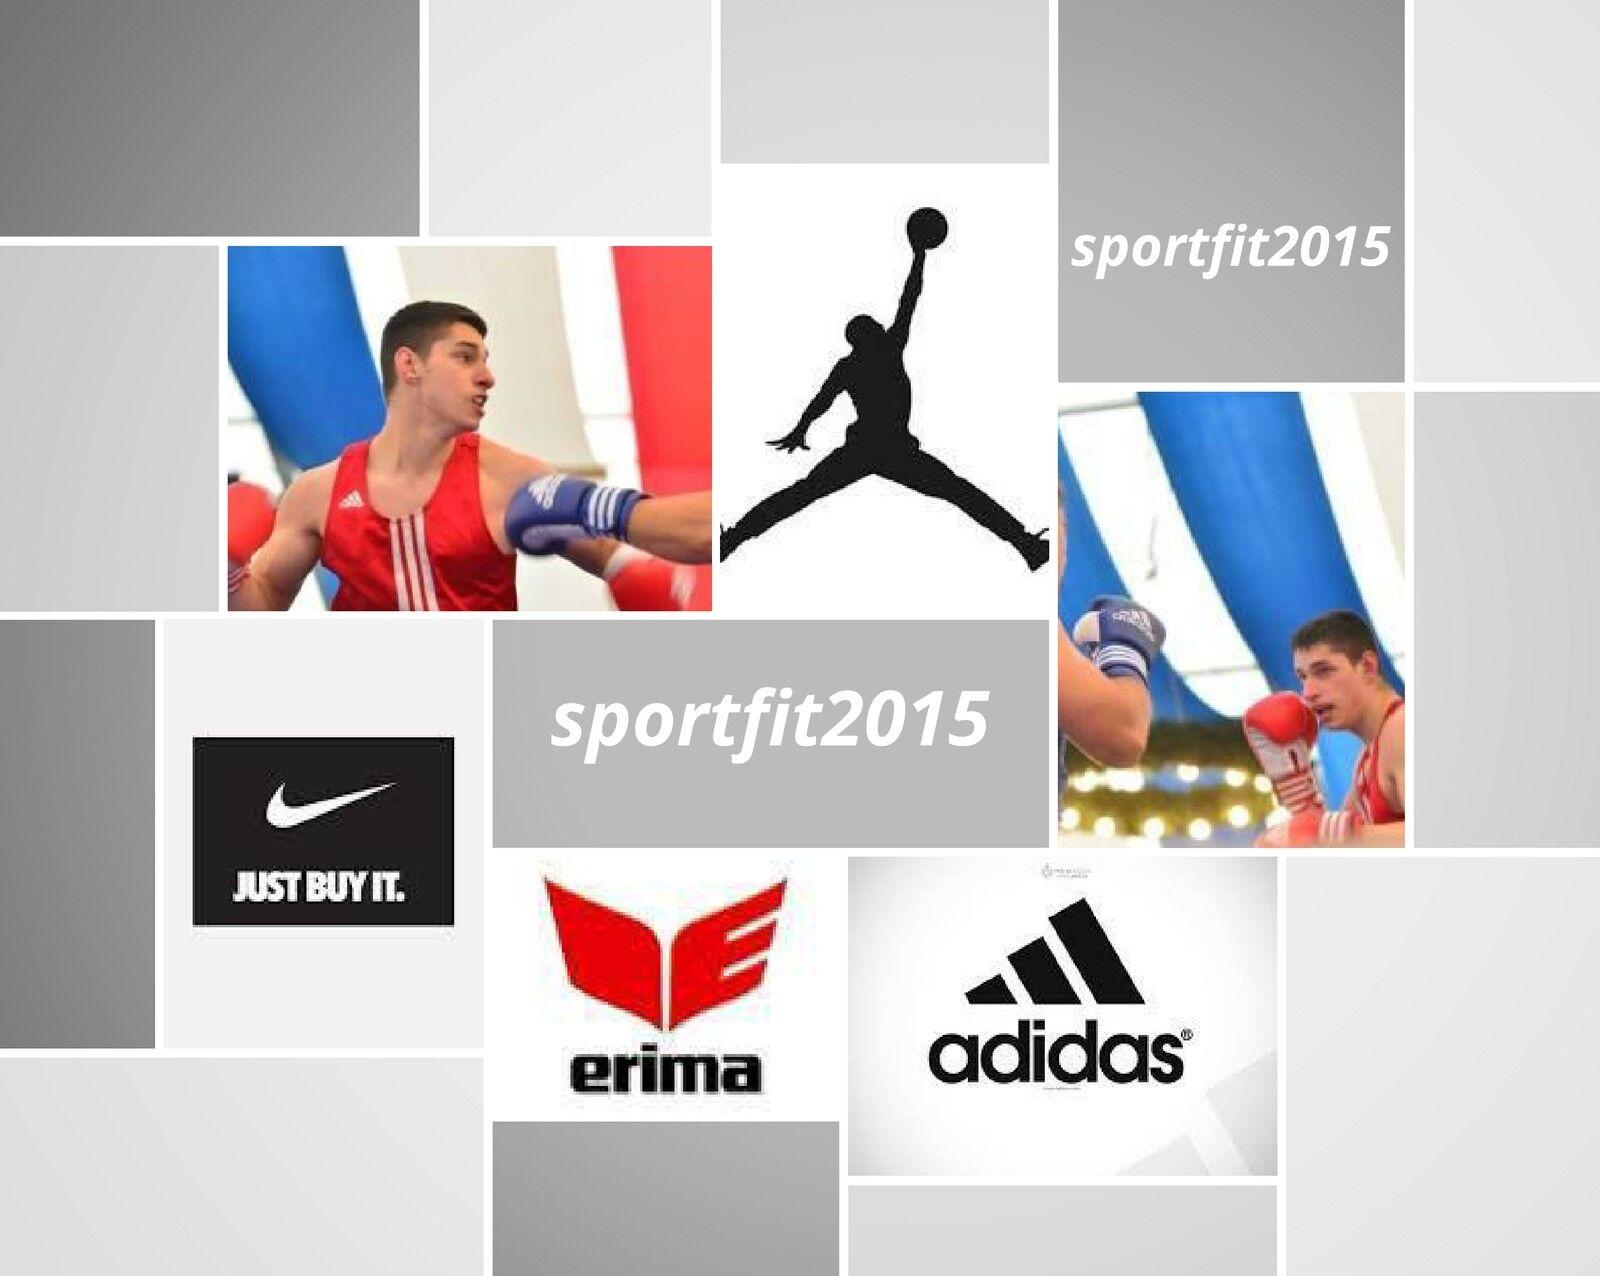 sportfit2015